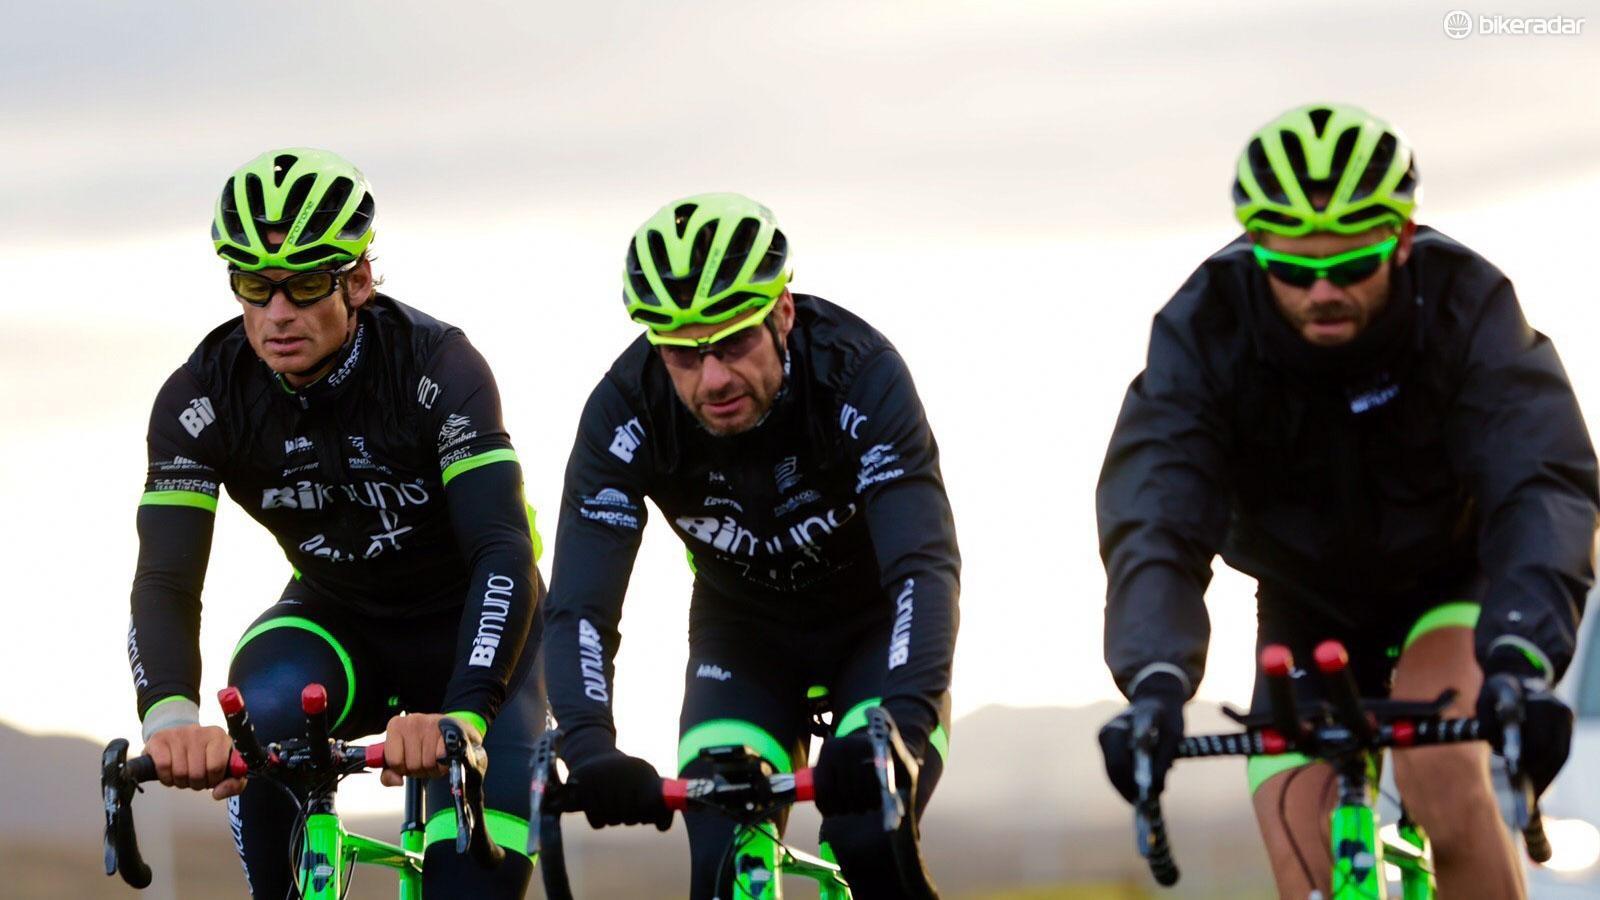 South African Mark Blewett riding between Englishman Nicolas Bourne and Zimbabwean David Martin